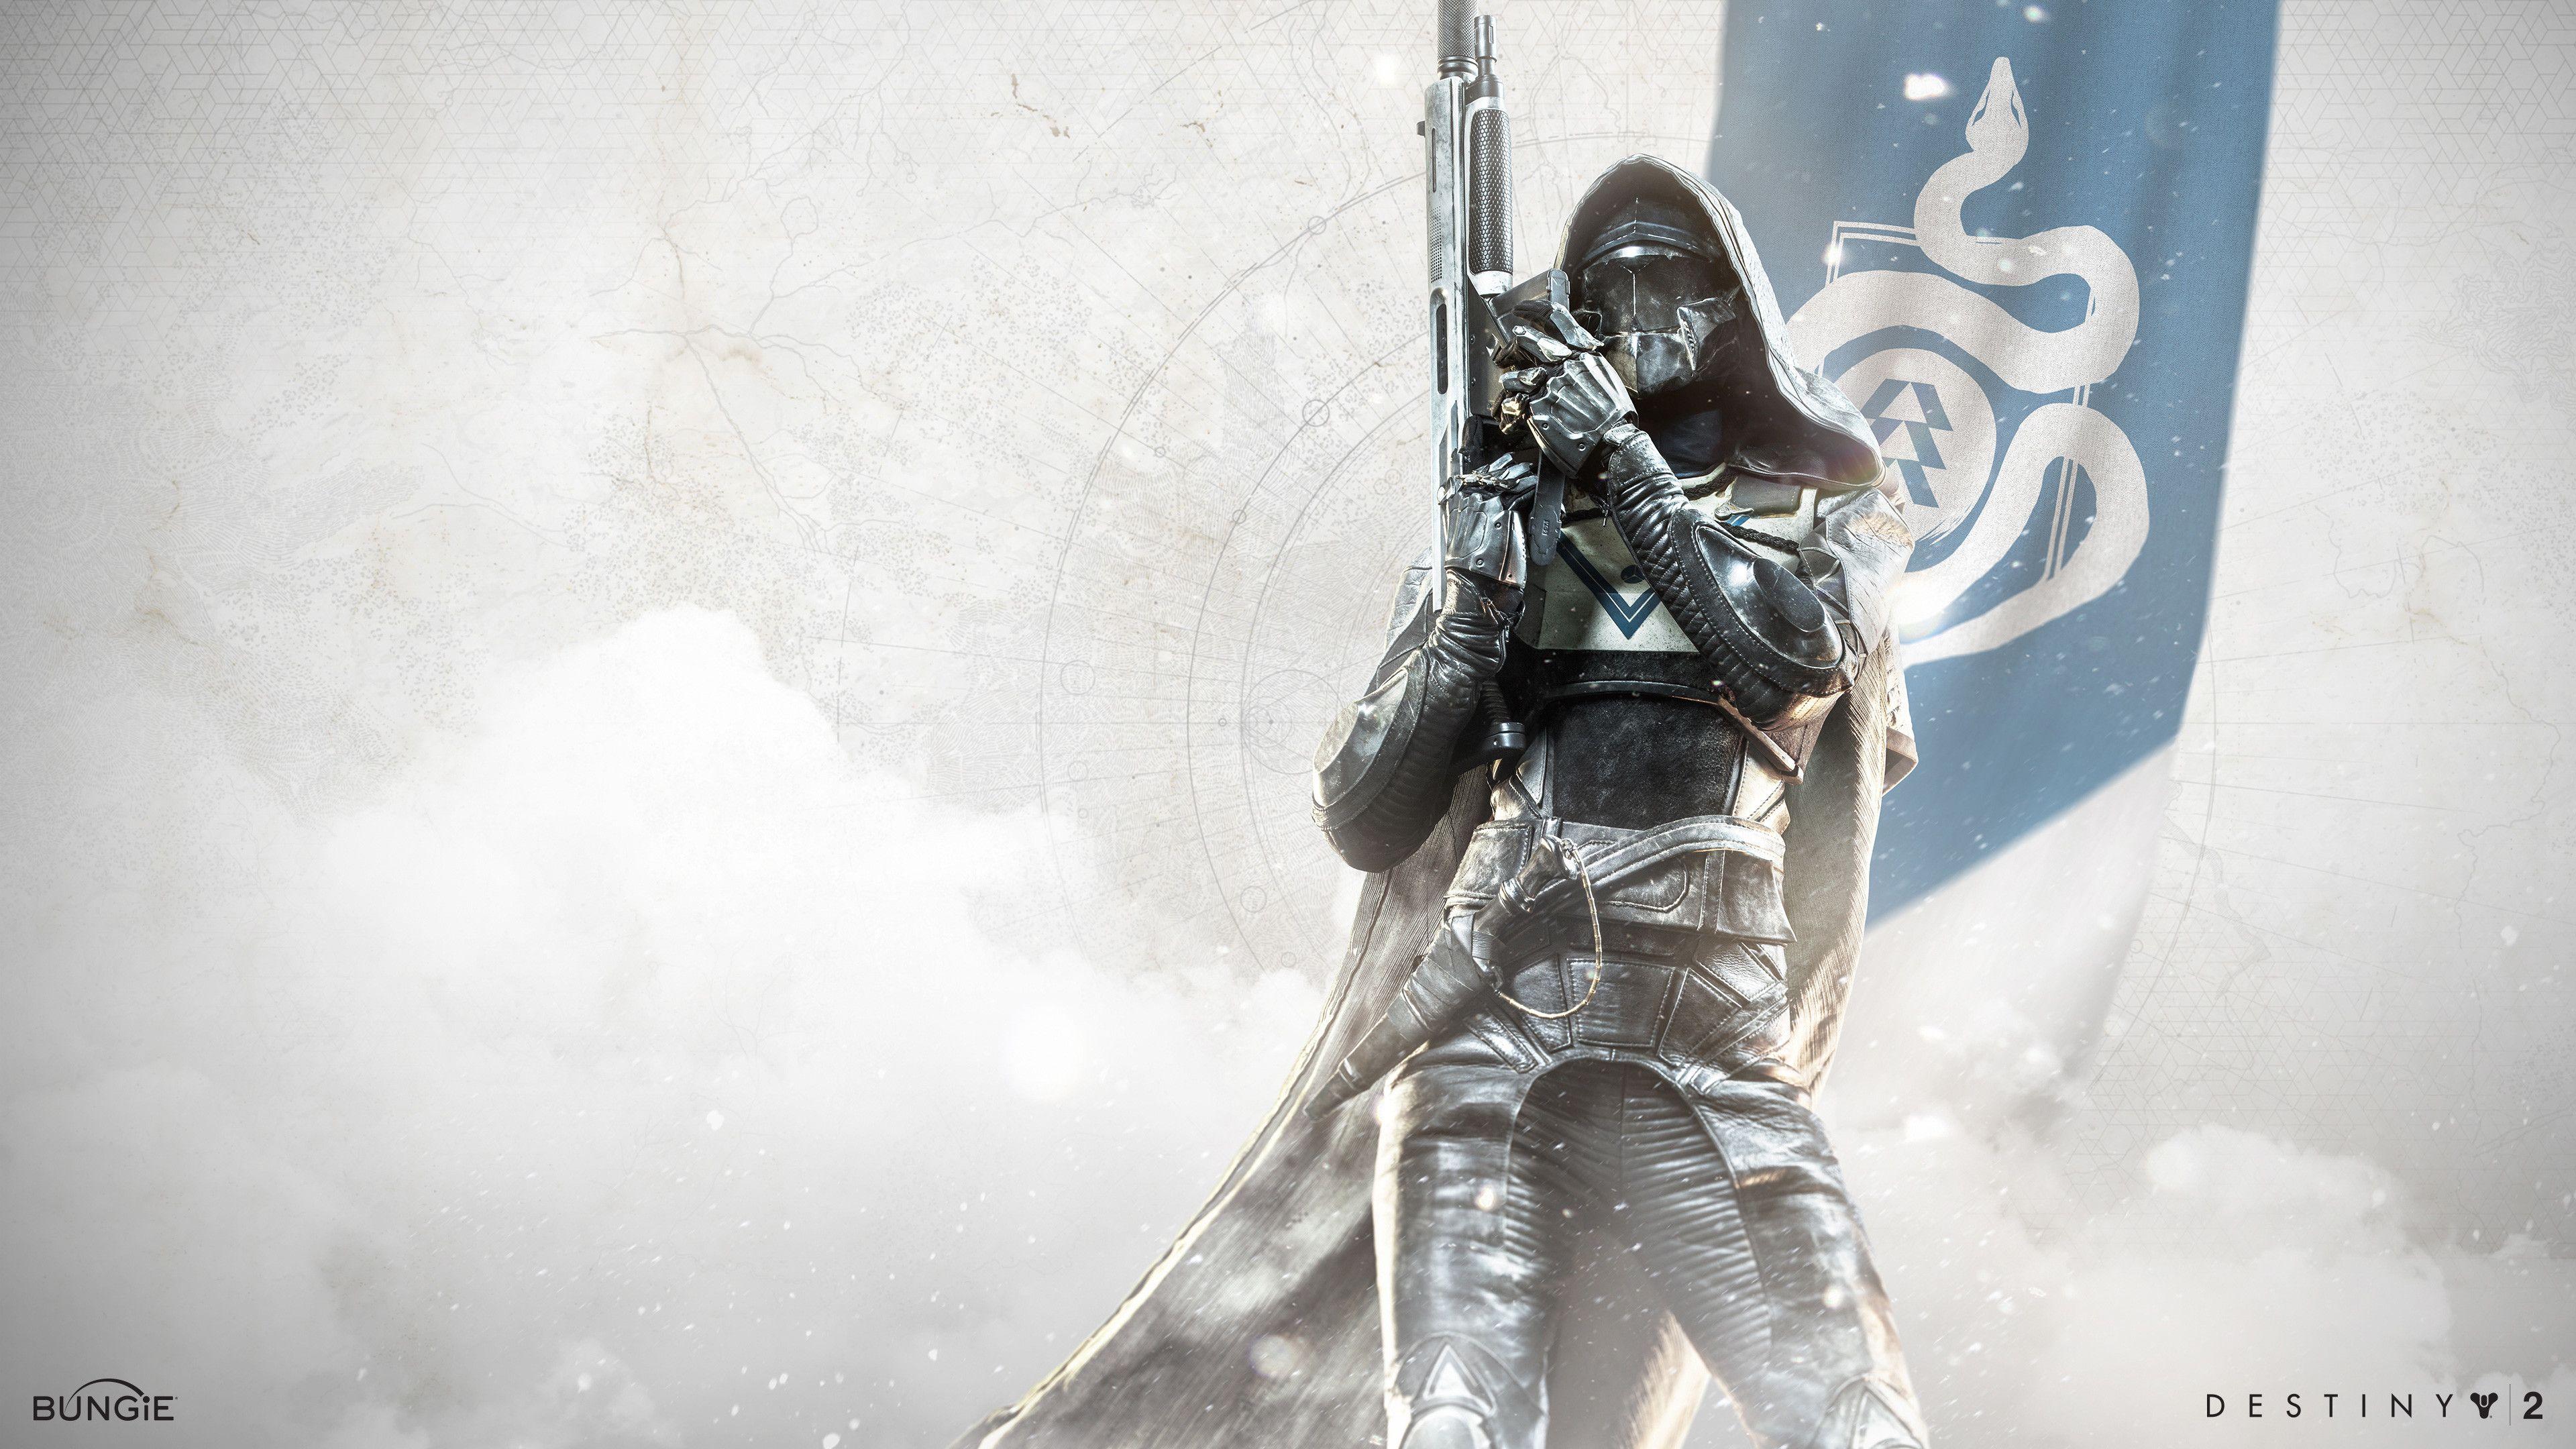 Destiny 2 Beyond Light Official Cinematic Reveal Trailer Gaming Desk Di 2020